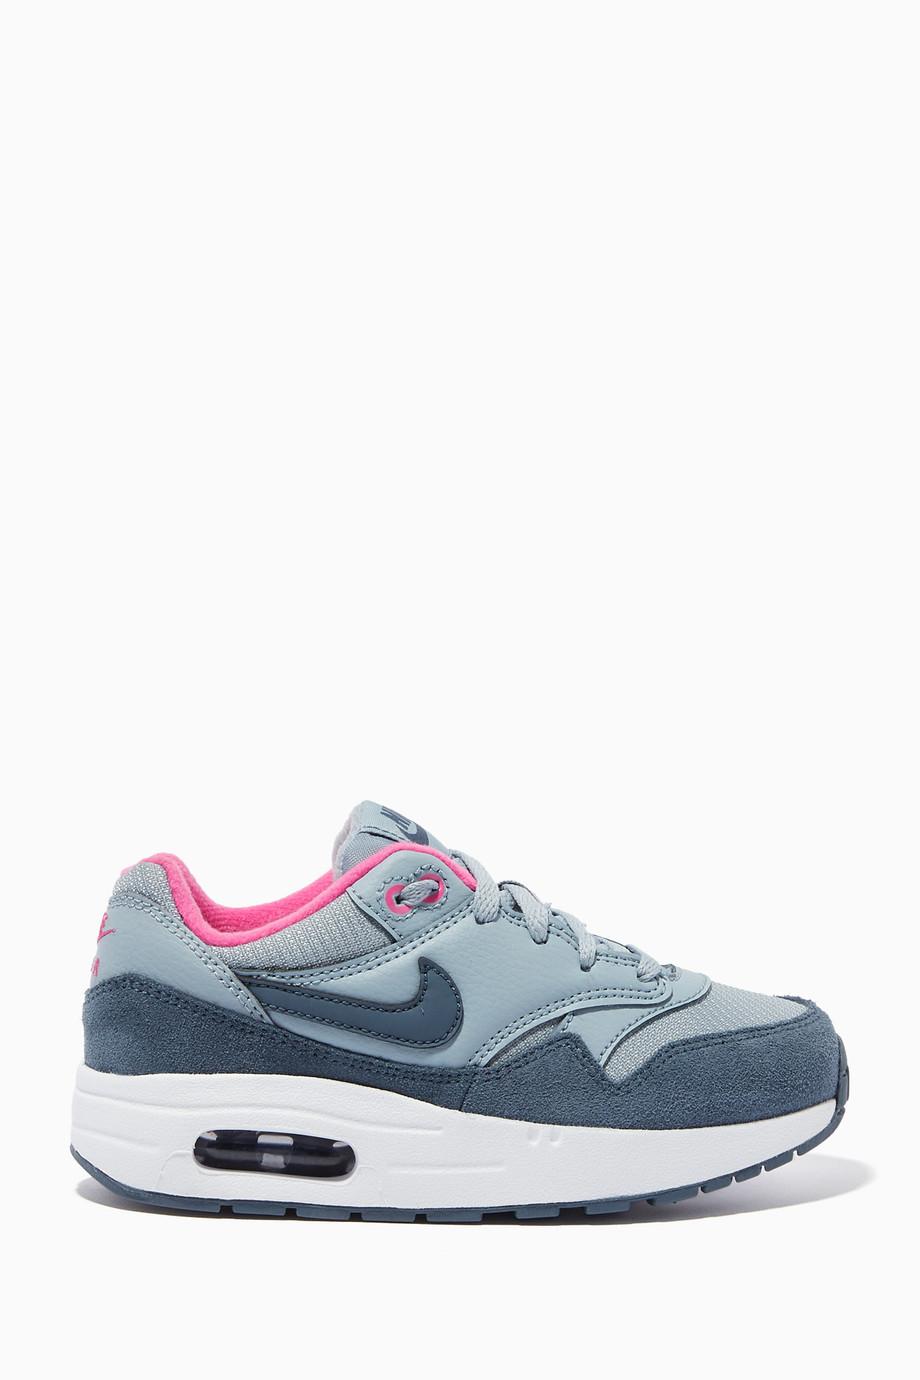 ab32258964 Shop Nike Blue Blue Nike Air Max Sneakers for Kids | Ounass UAE